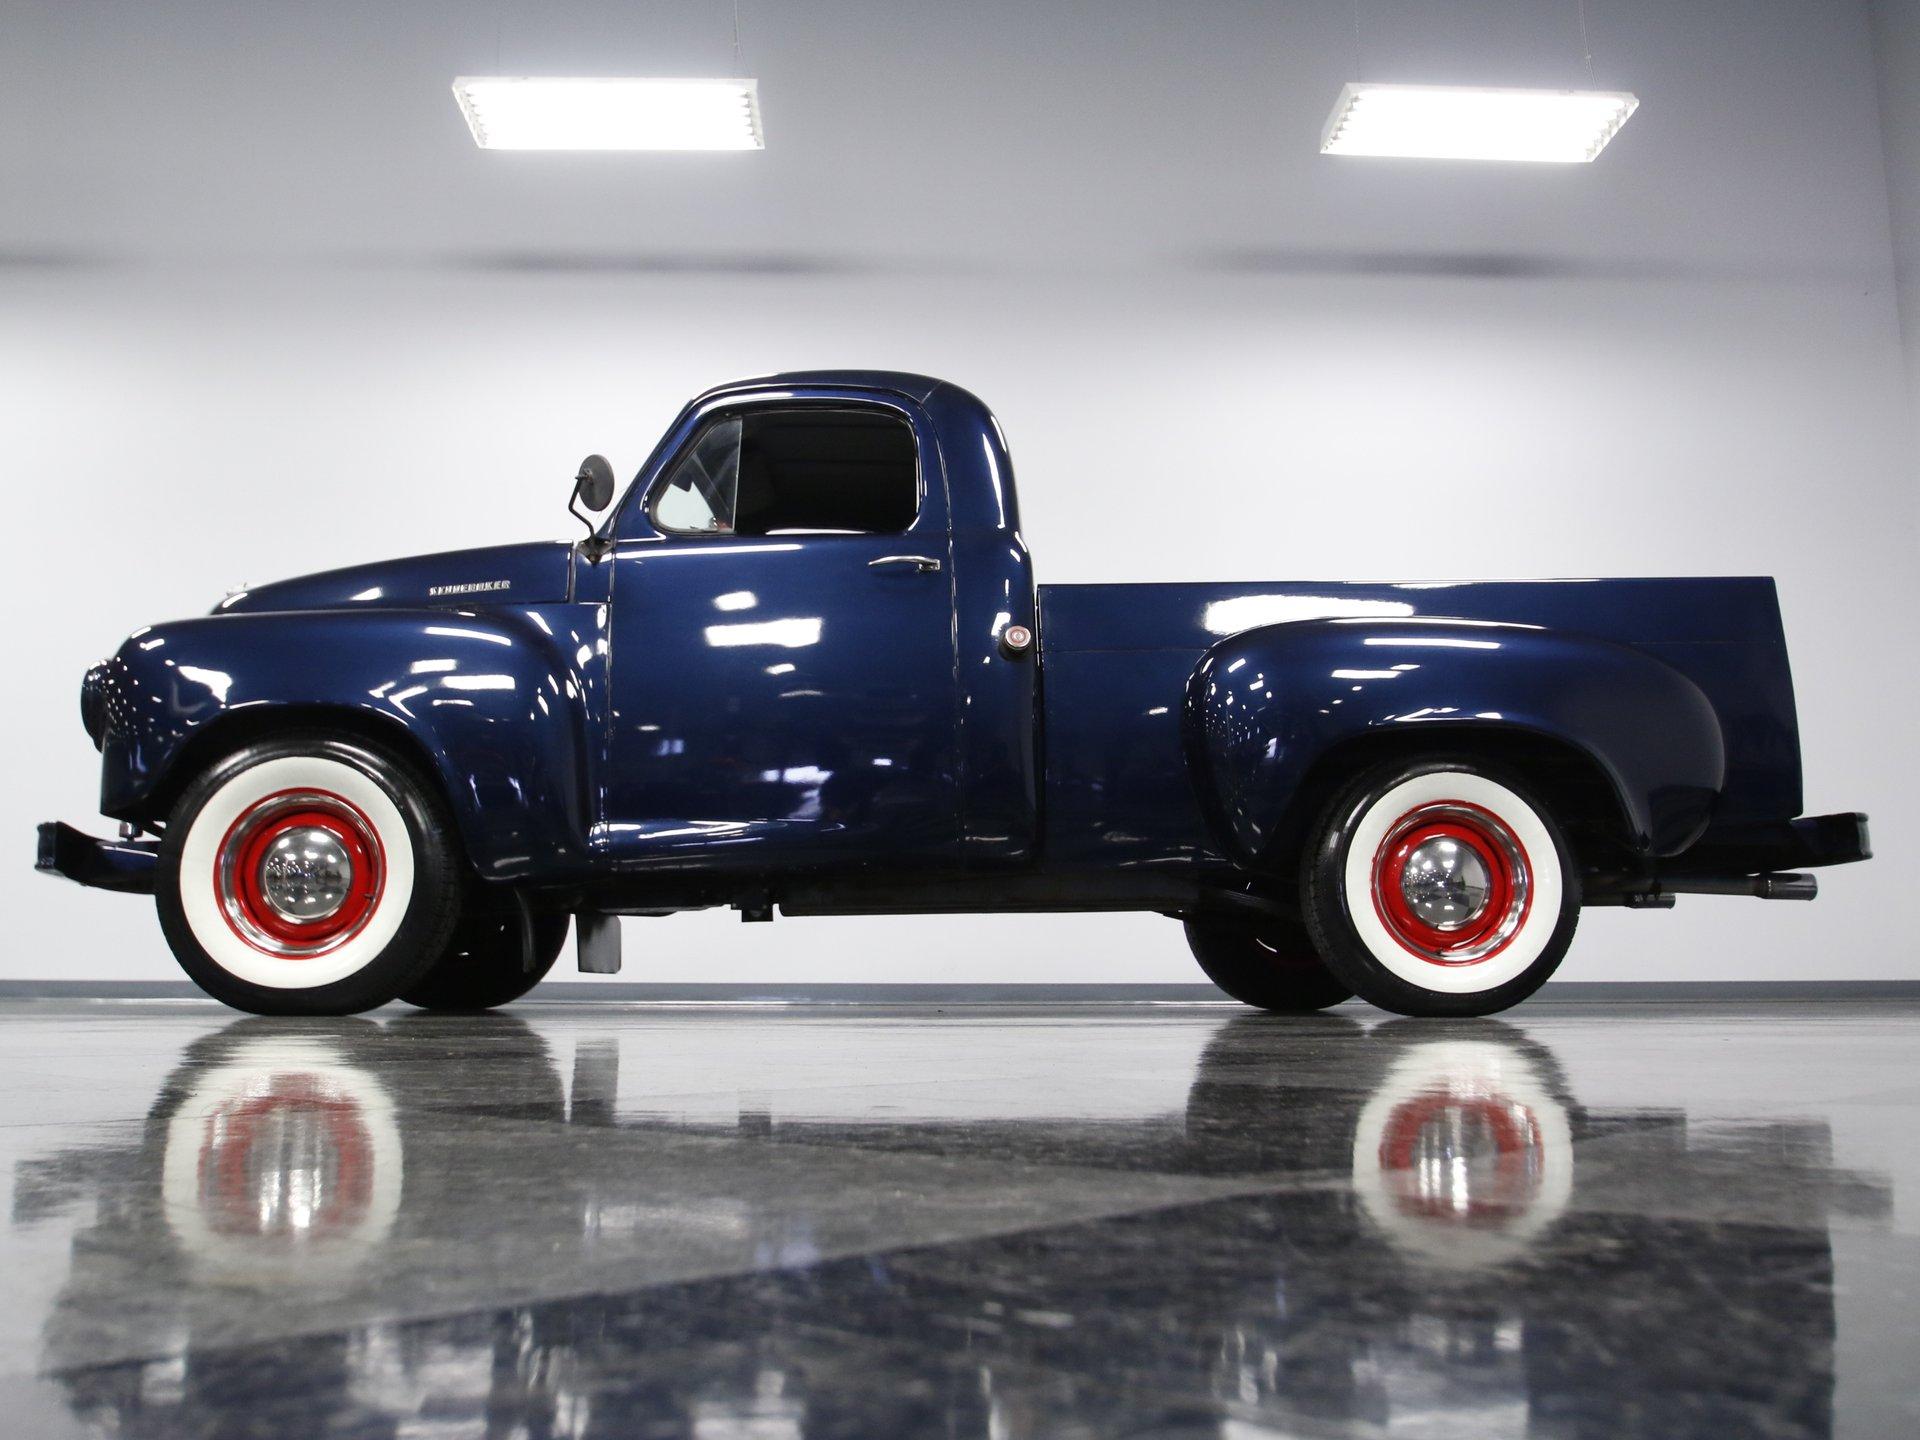 1950 Studebaker Pickup | Streetside Classics - The Nation's Trusted